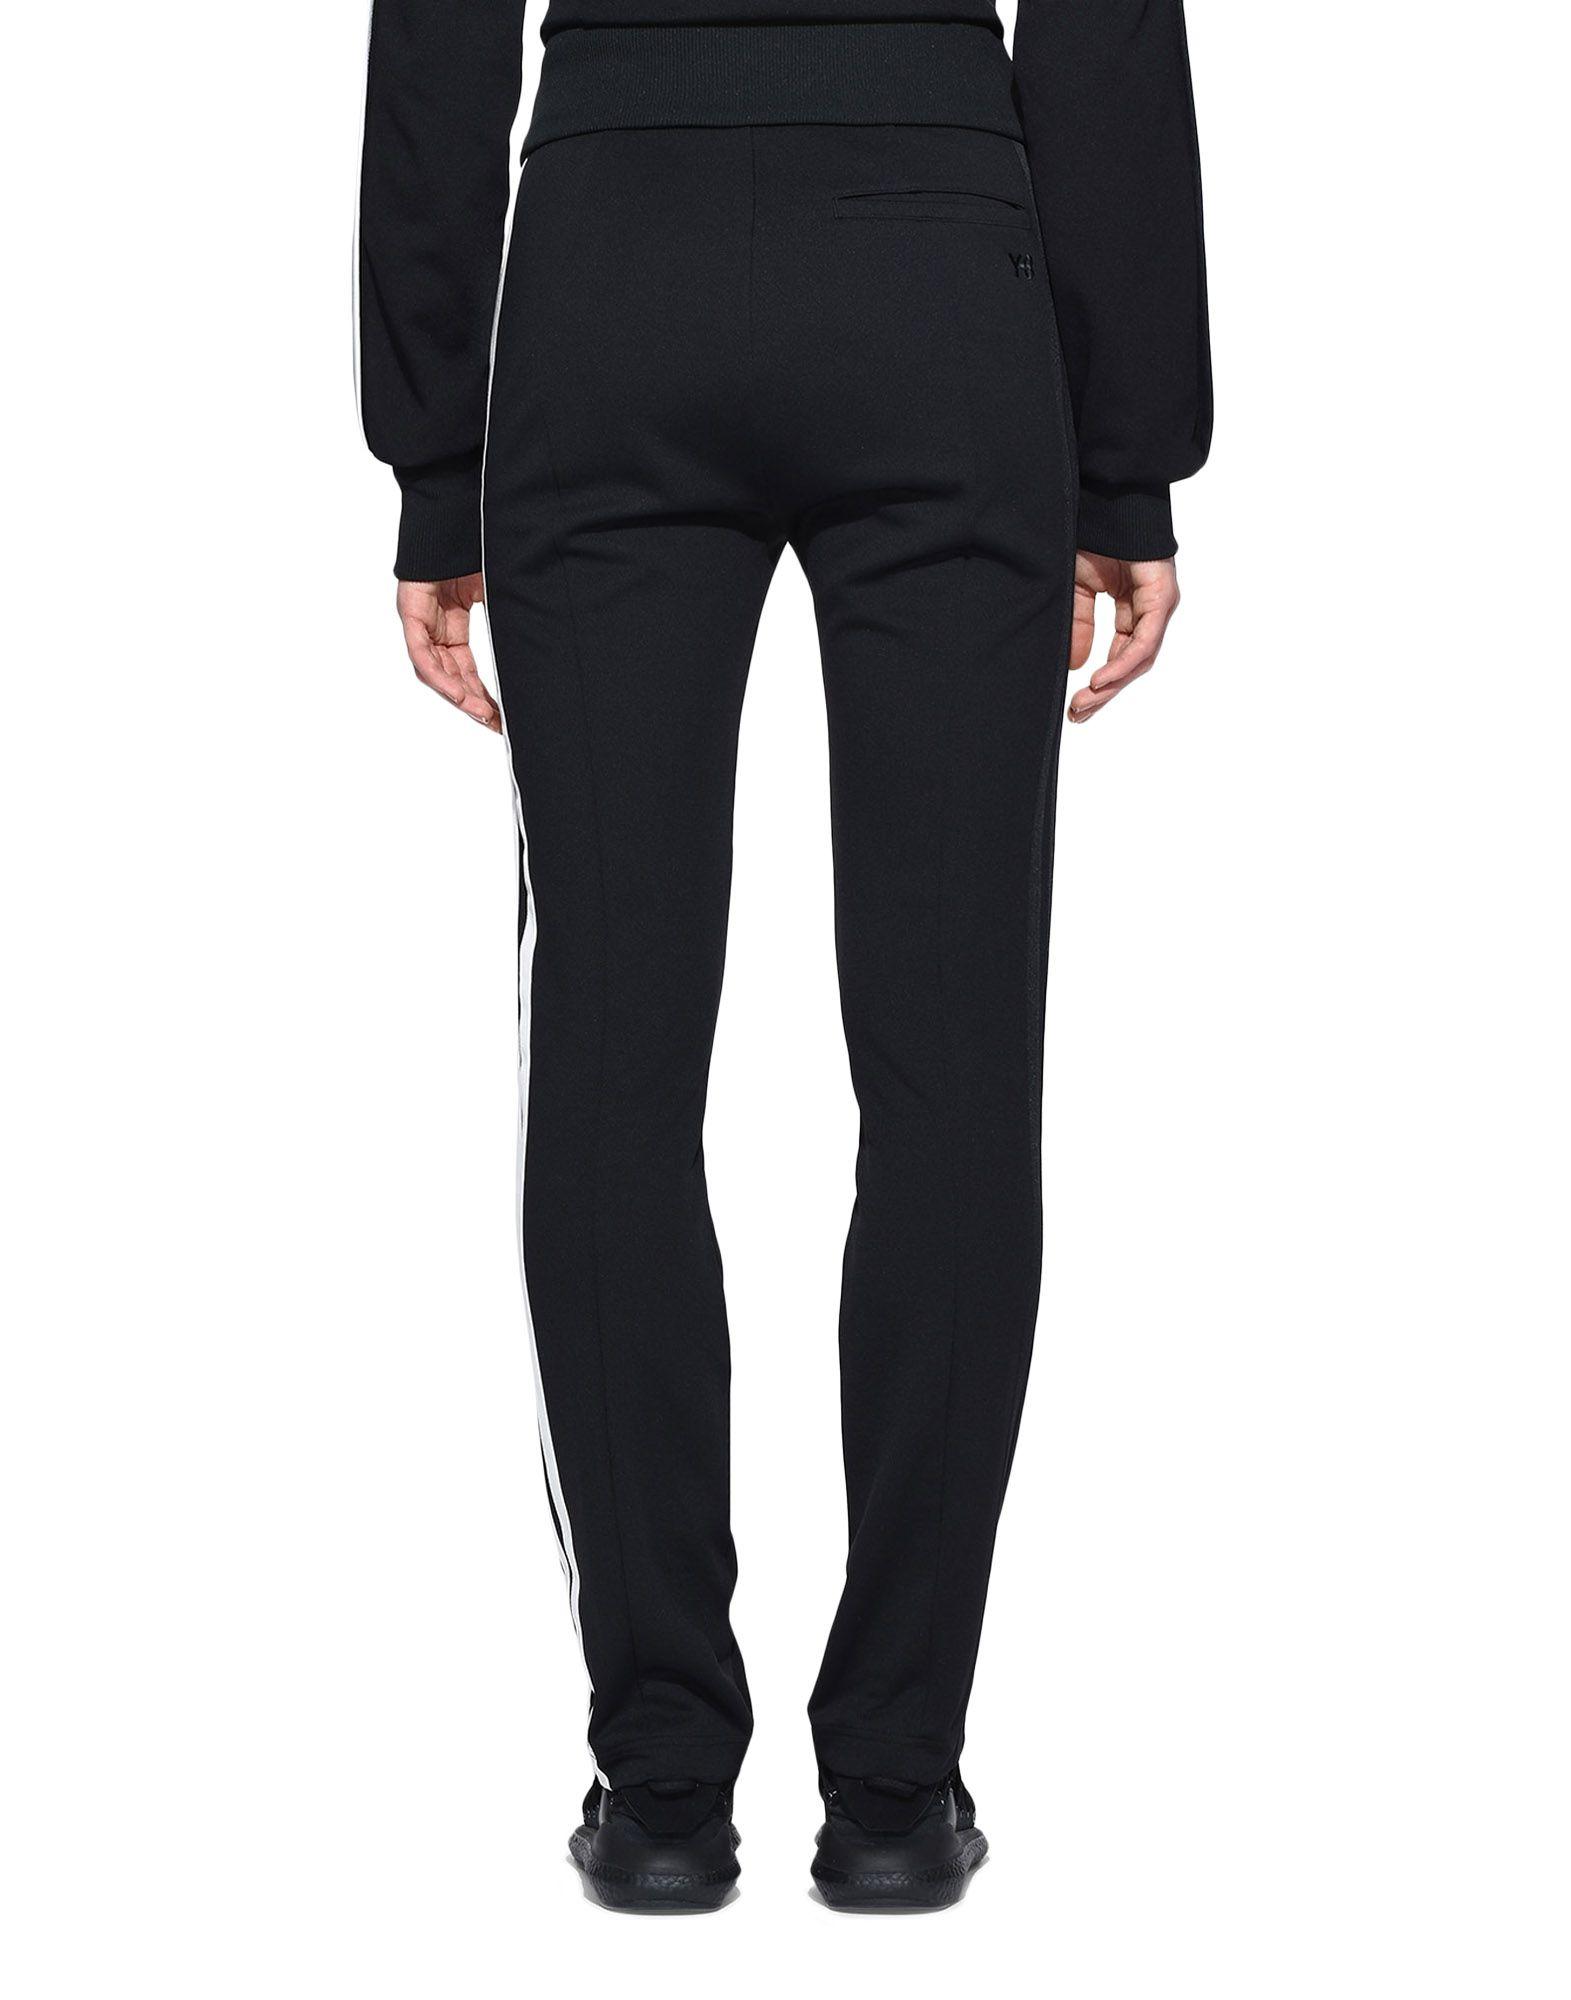 Y-3 Y-3 High Waist Matte Track Pants Casual pants Woman d